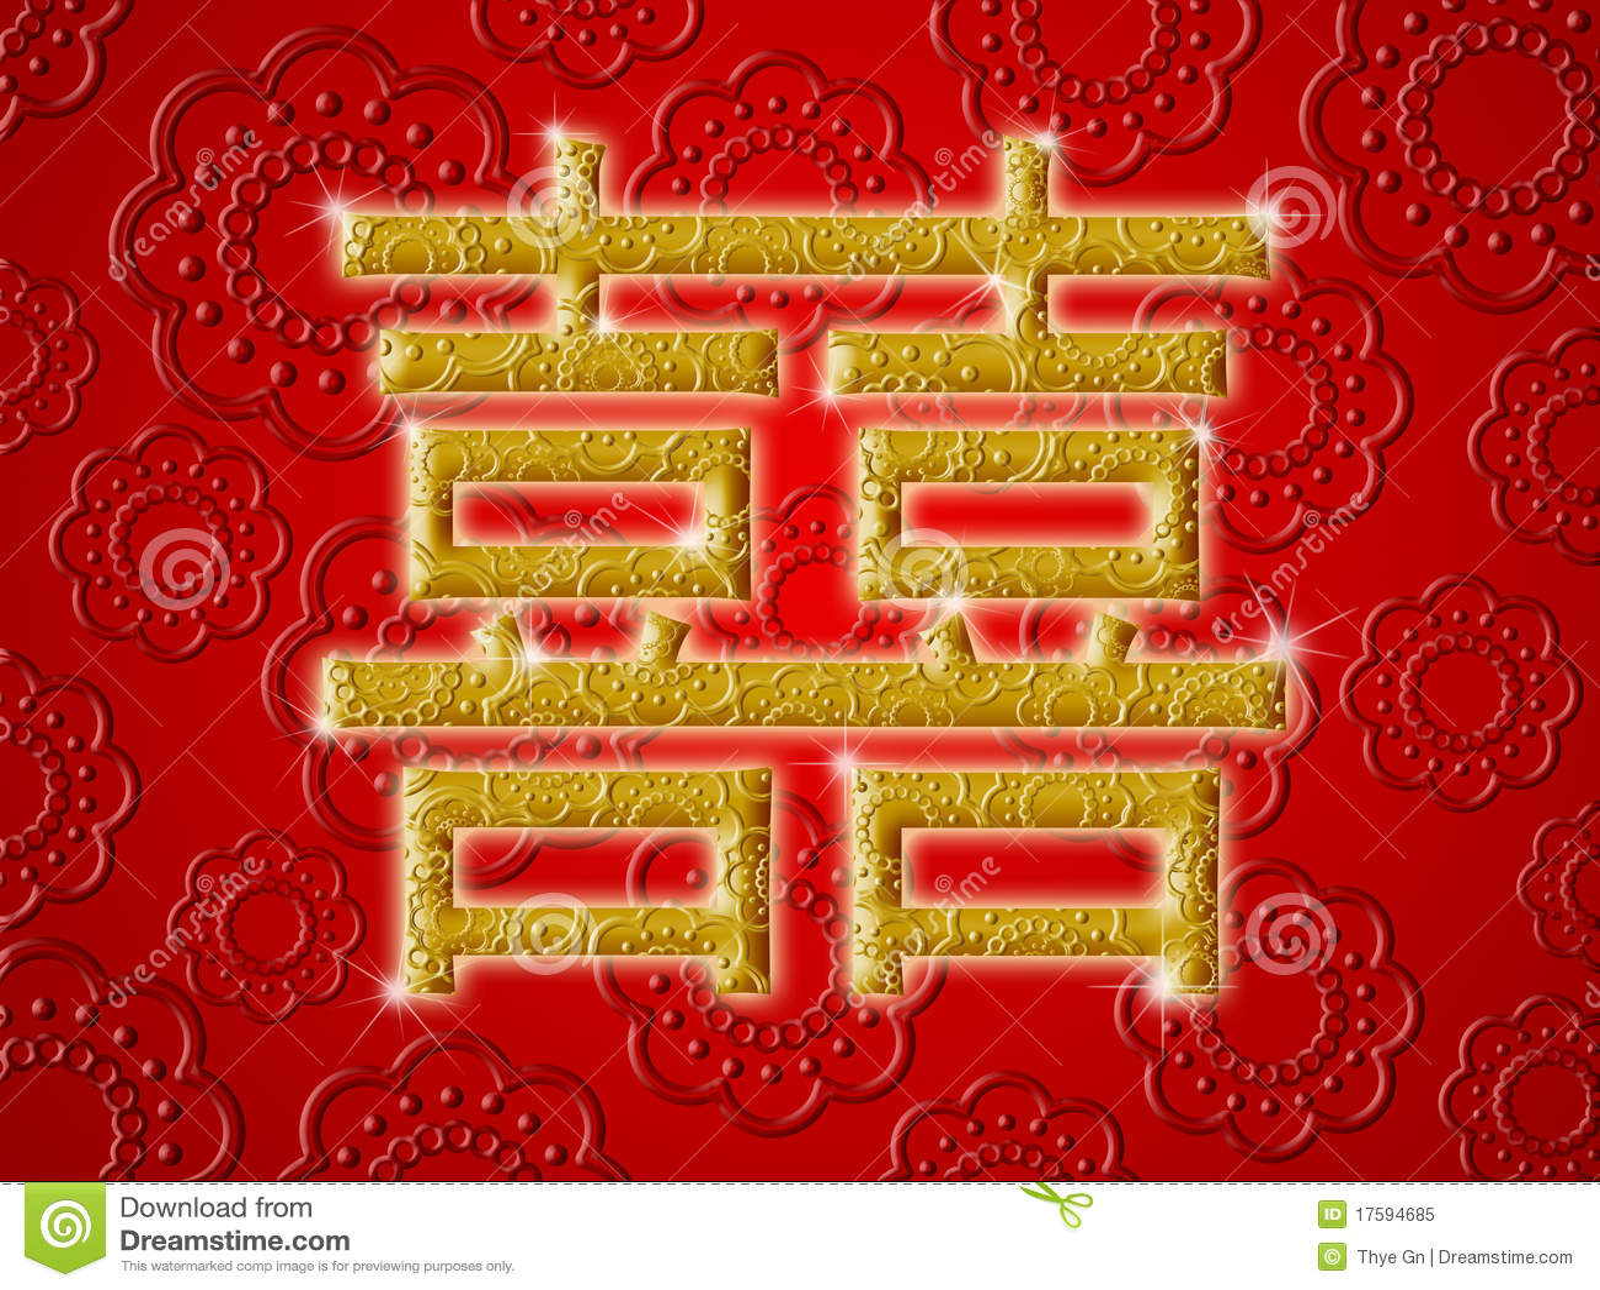 Chinese Wedding Double Happiness Symbol Royalty Free Stock Photo Image 17594685